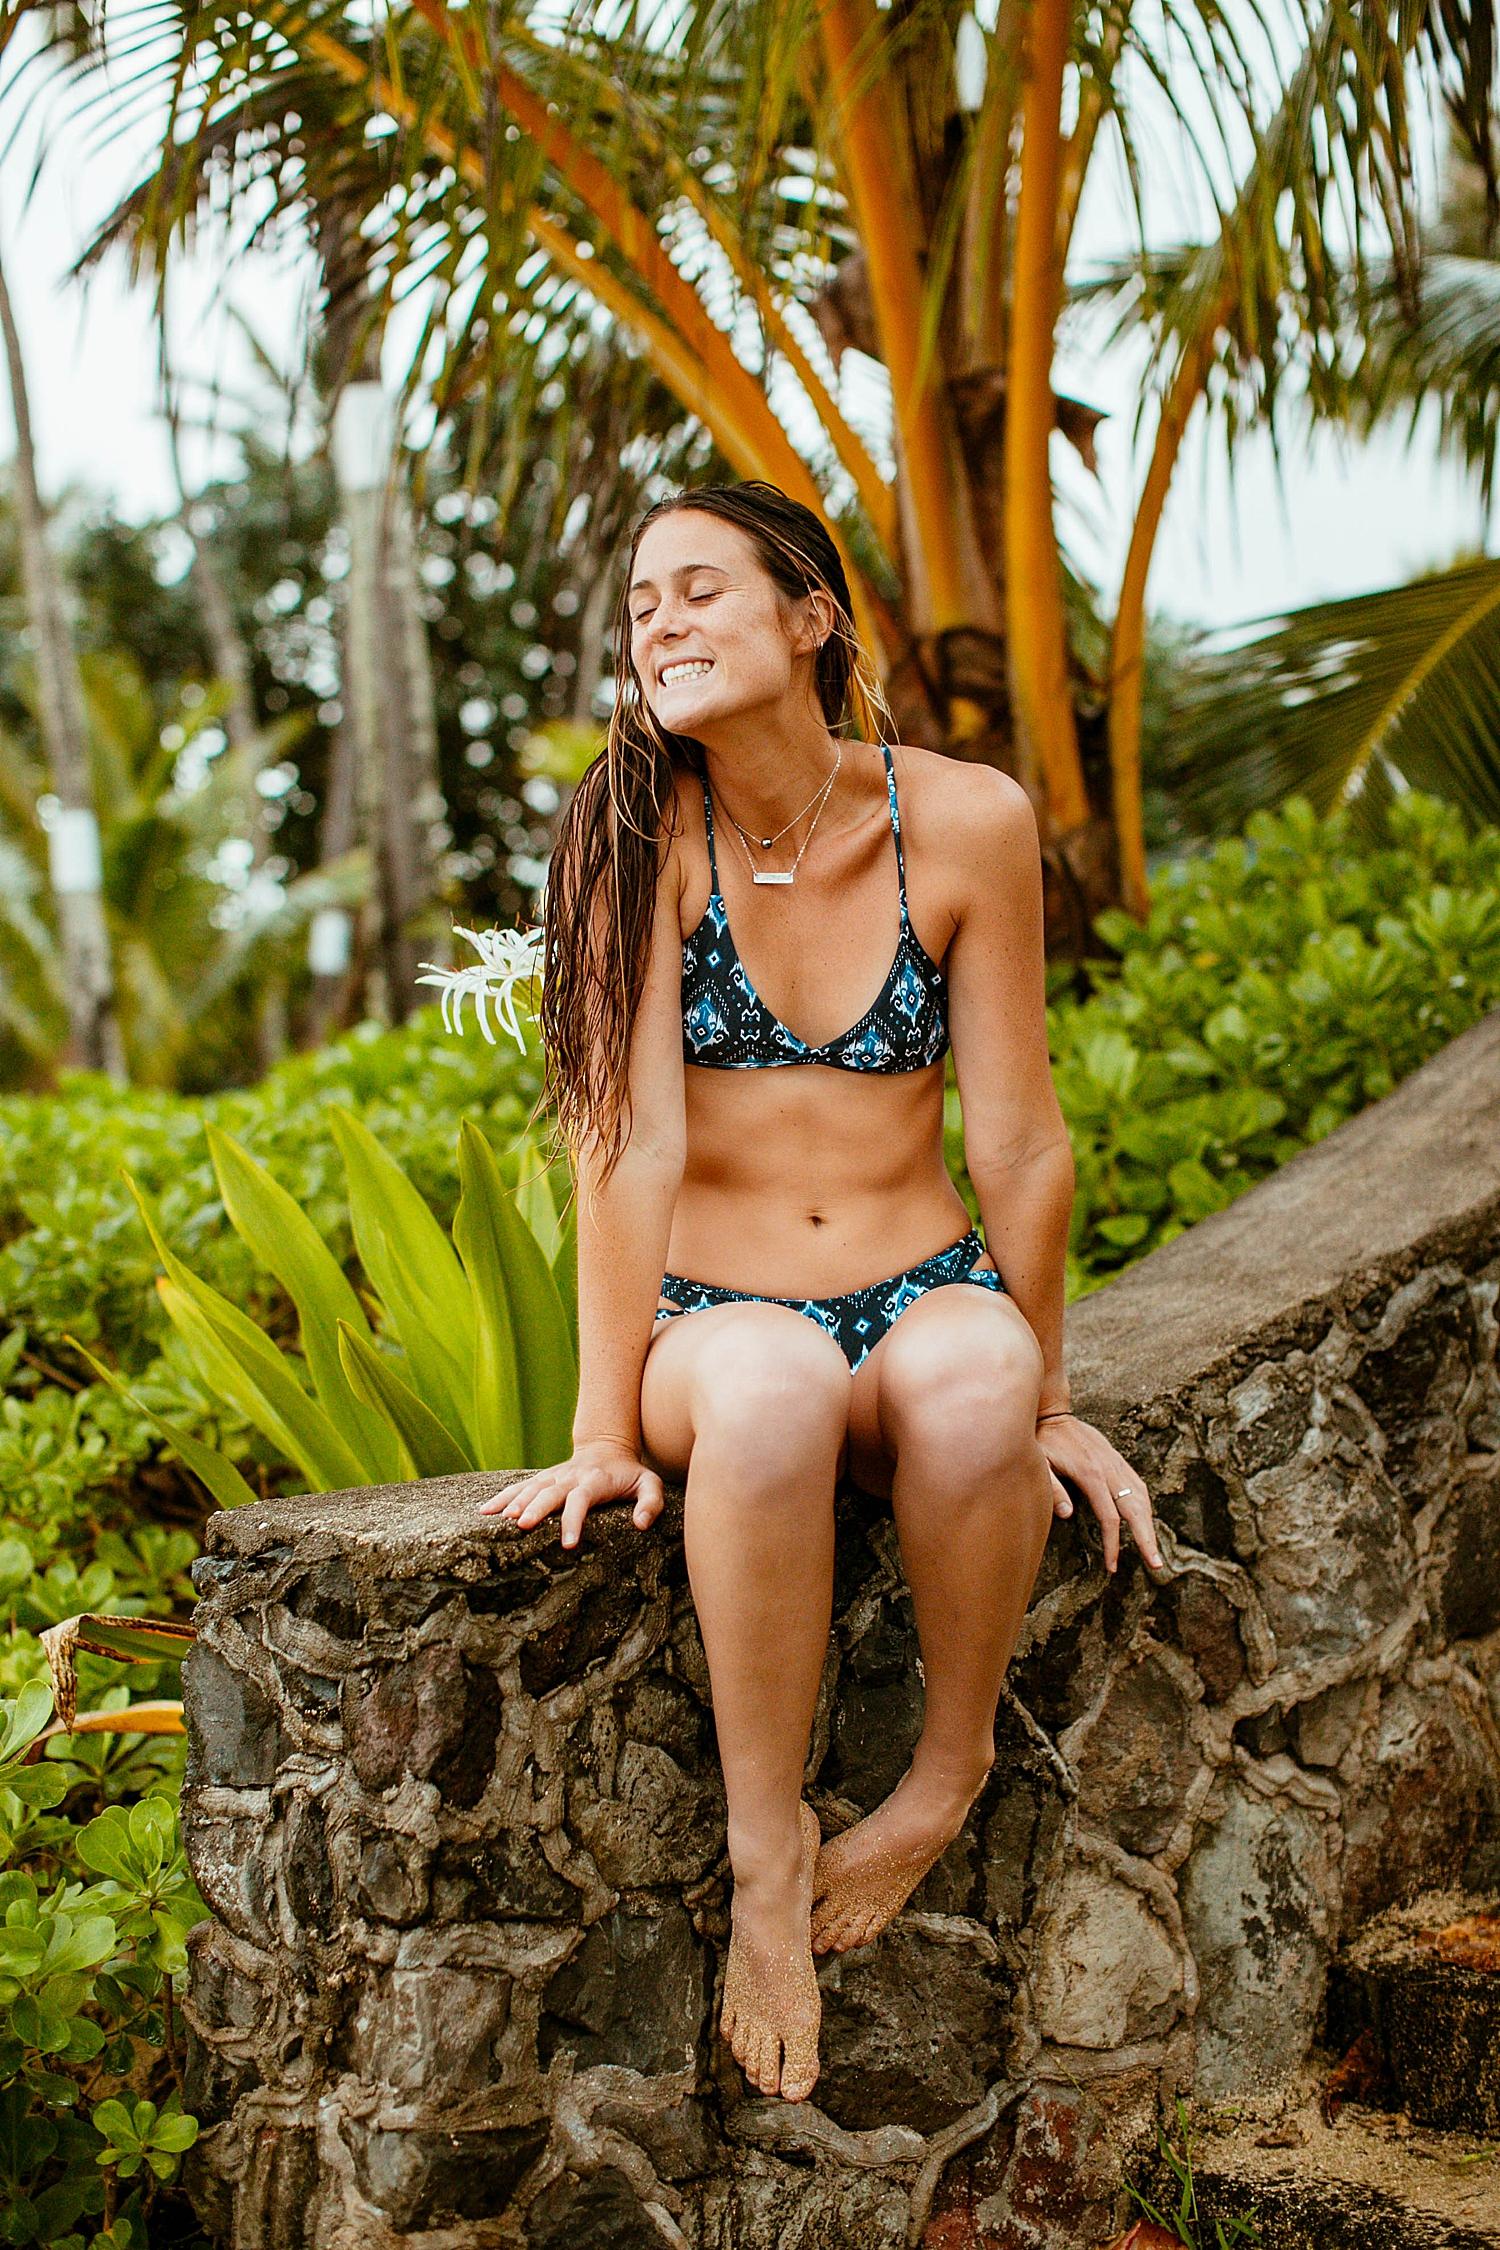 Travel & Lifestyle Fashion Photography with Benoa Swim, Cami and Jax, Bailey Nagy and Kiana Fores by Kelee Bovelle on North Shore Oahu Hawaii_0020.jpg